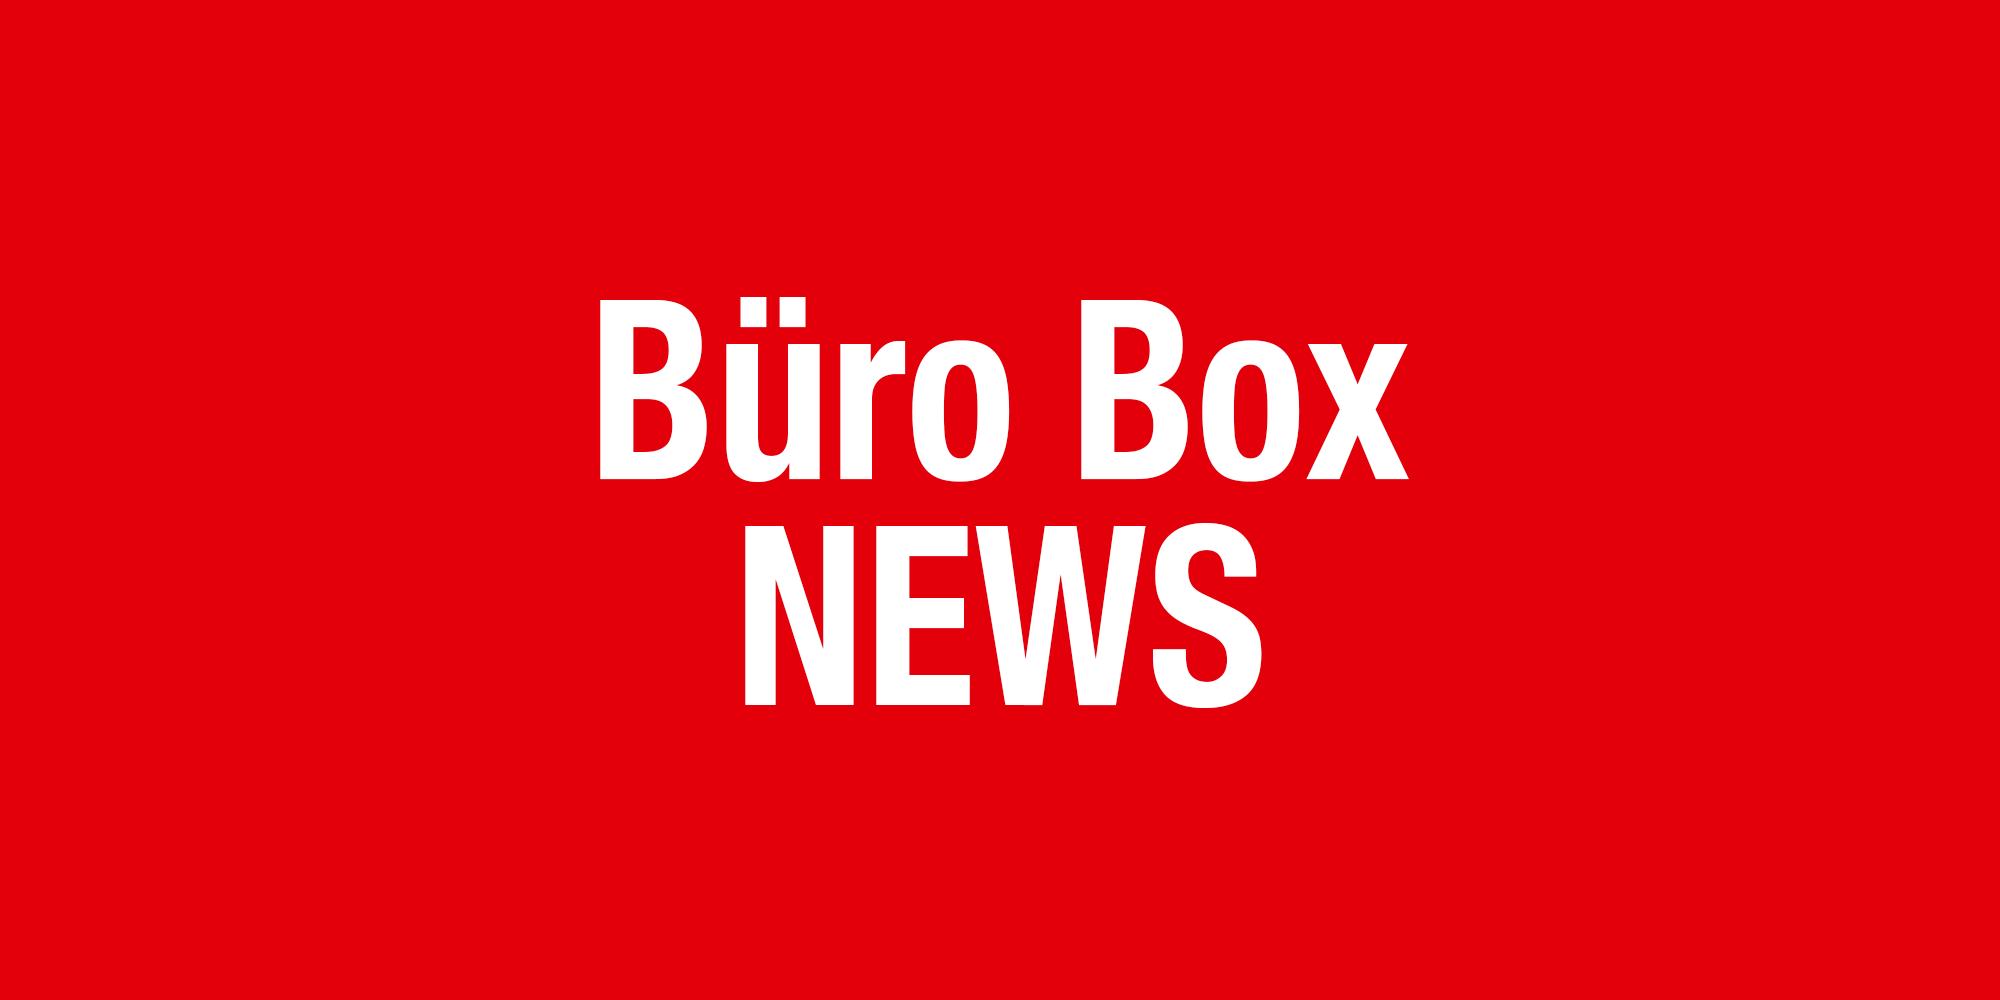 Büro Box Buxtehuder Büroartikel Markt: News